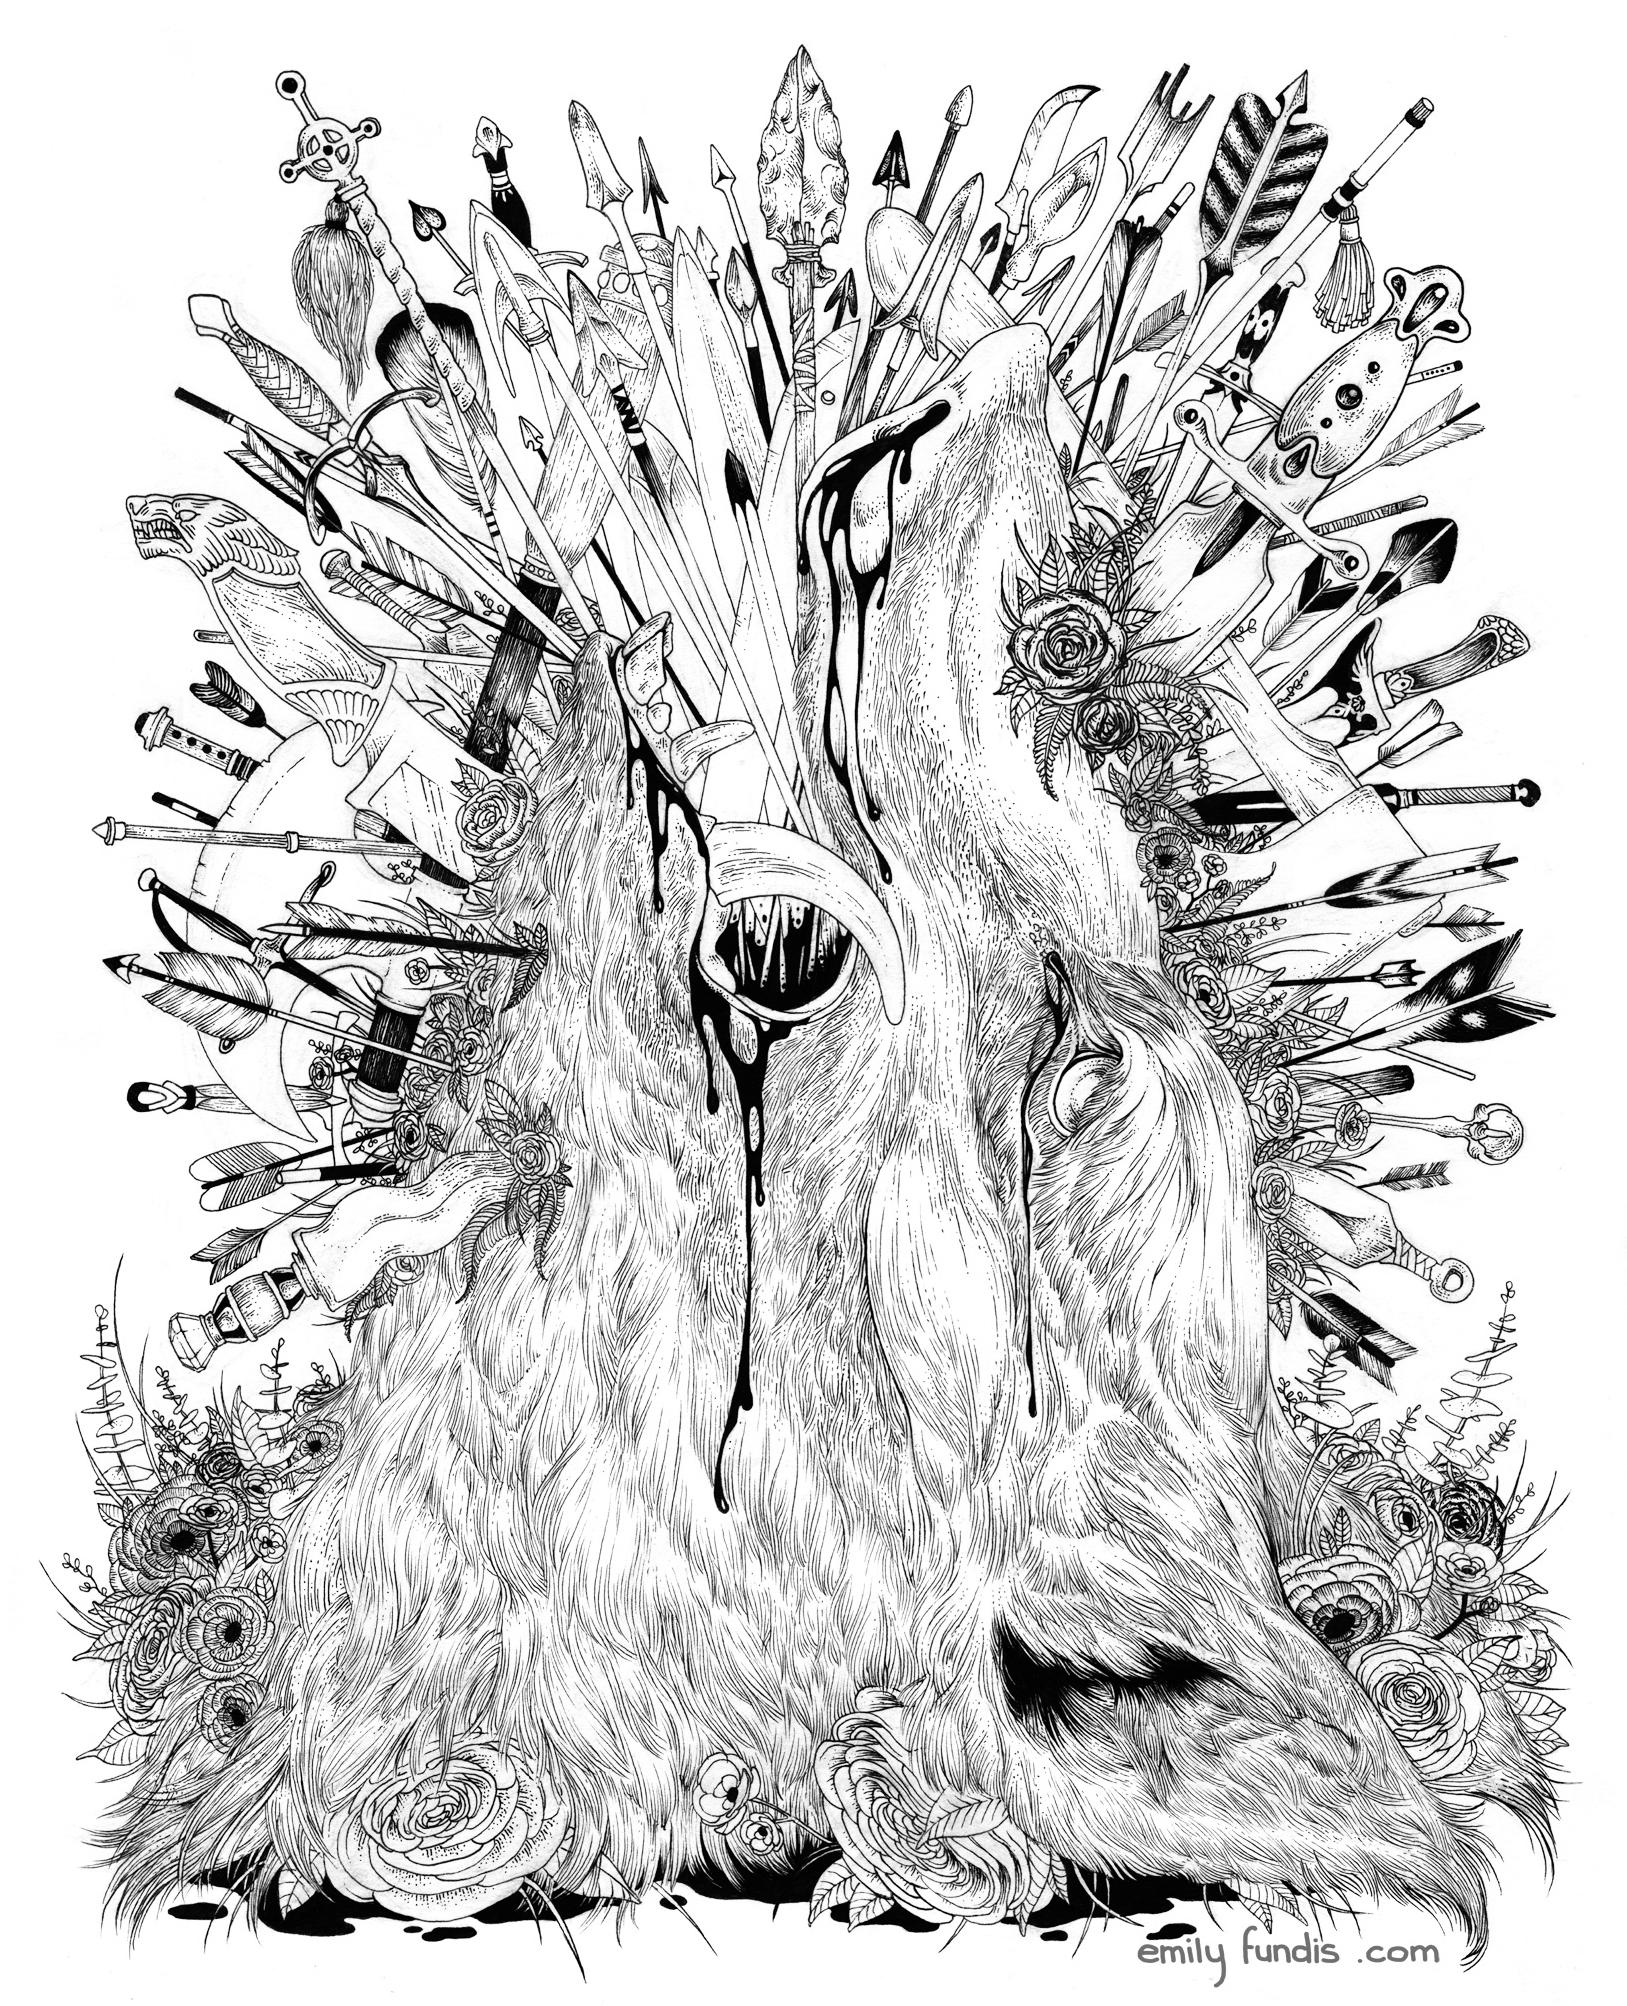 boar-glory-tumblr.jpg